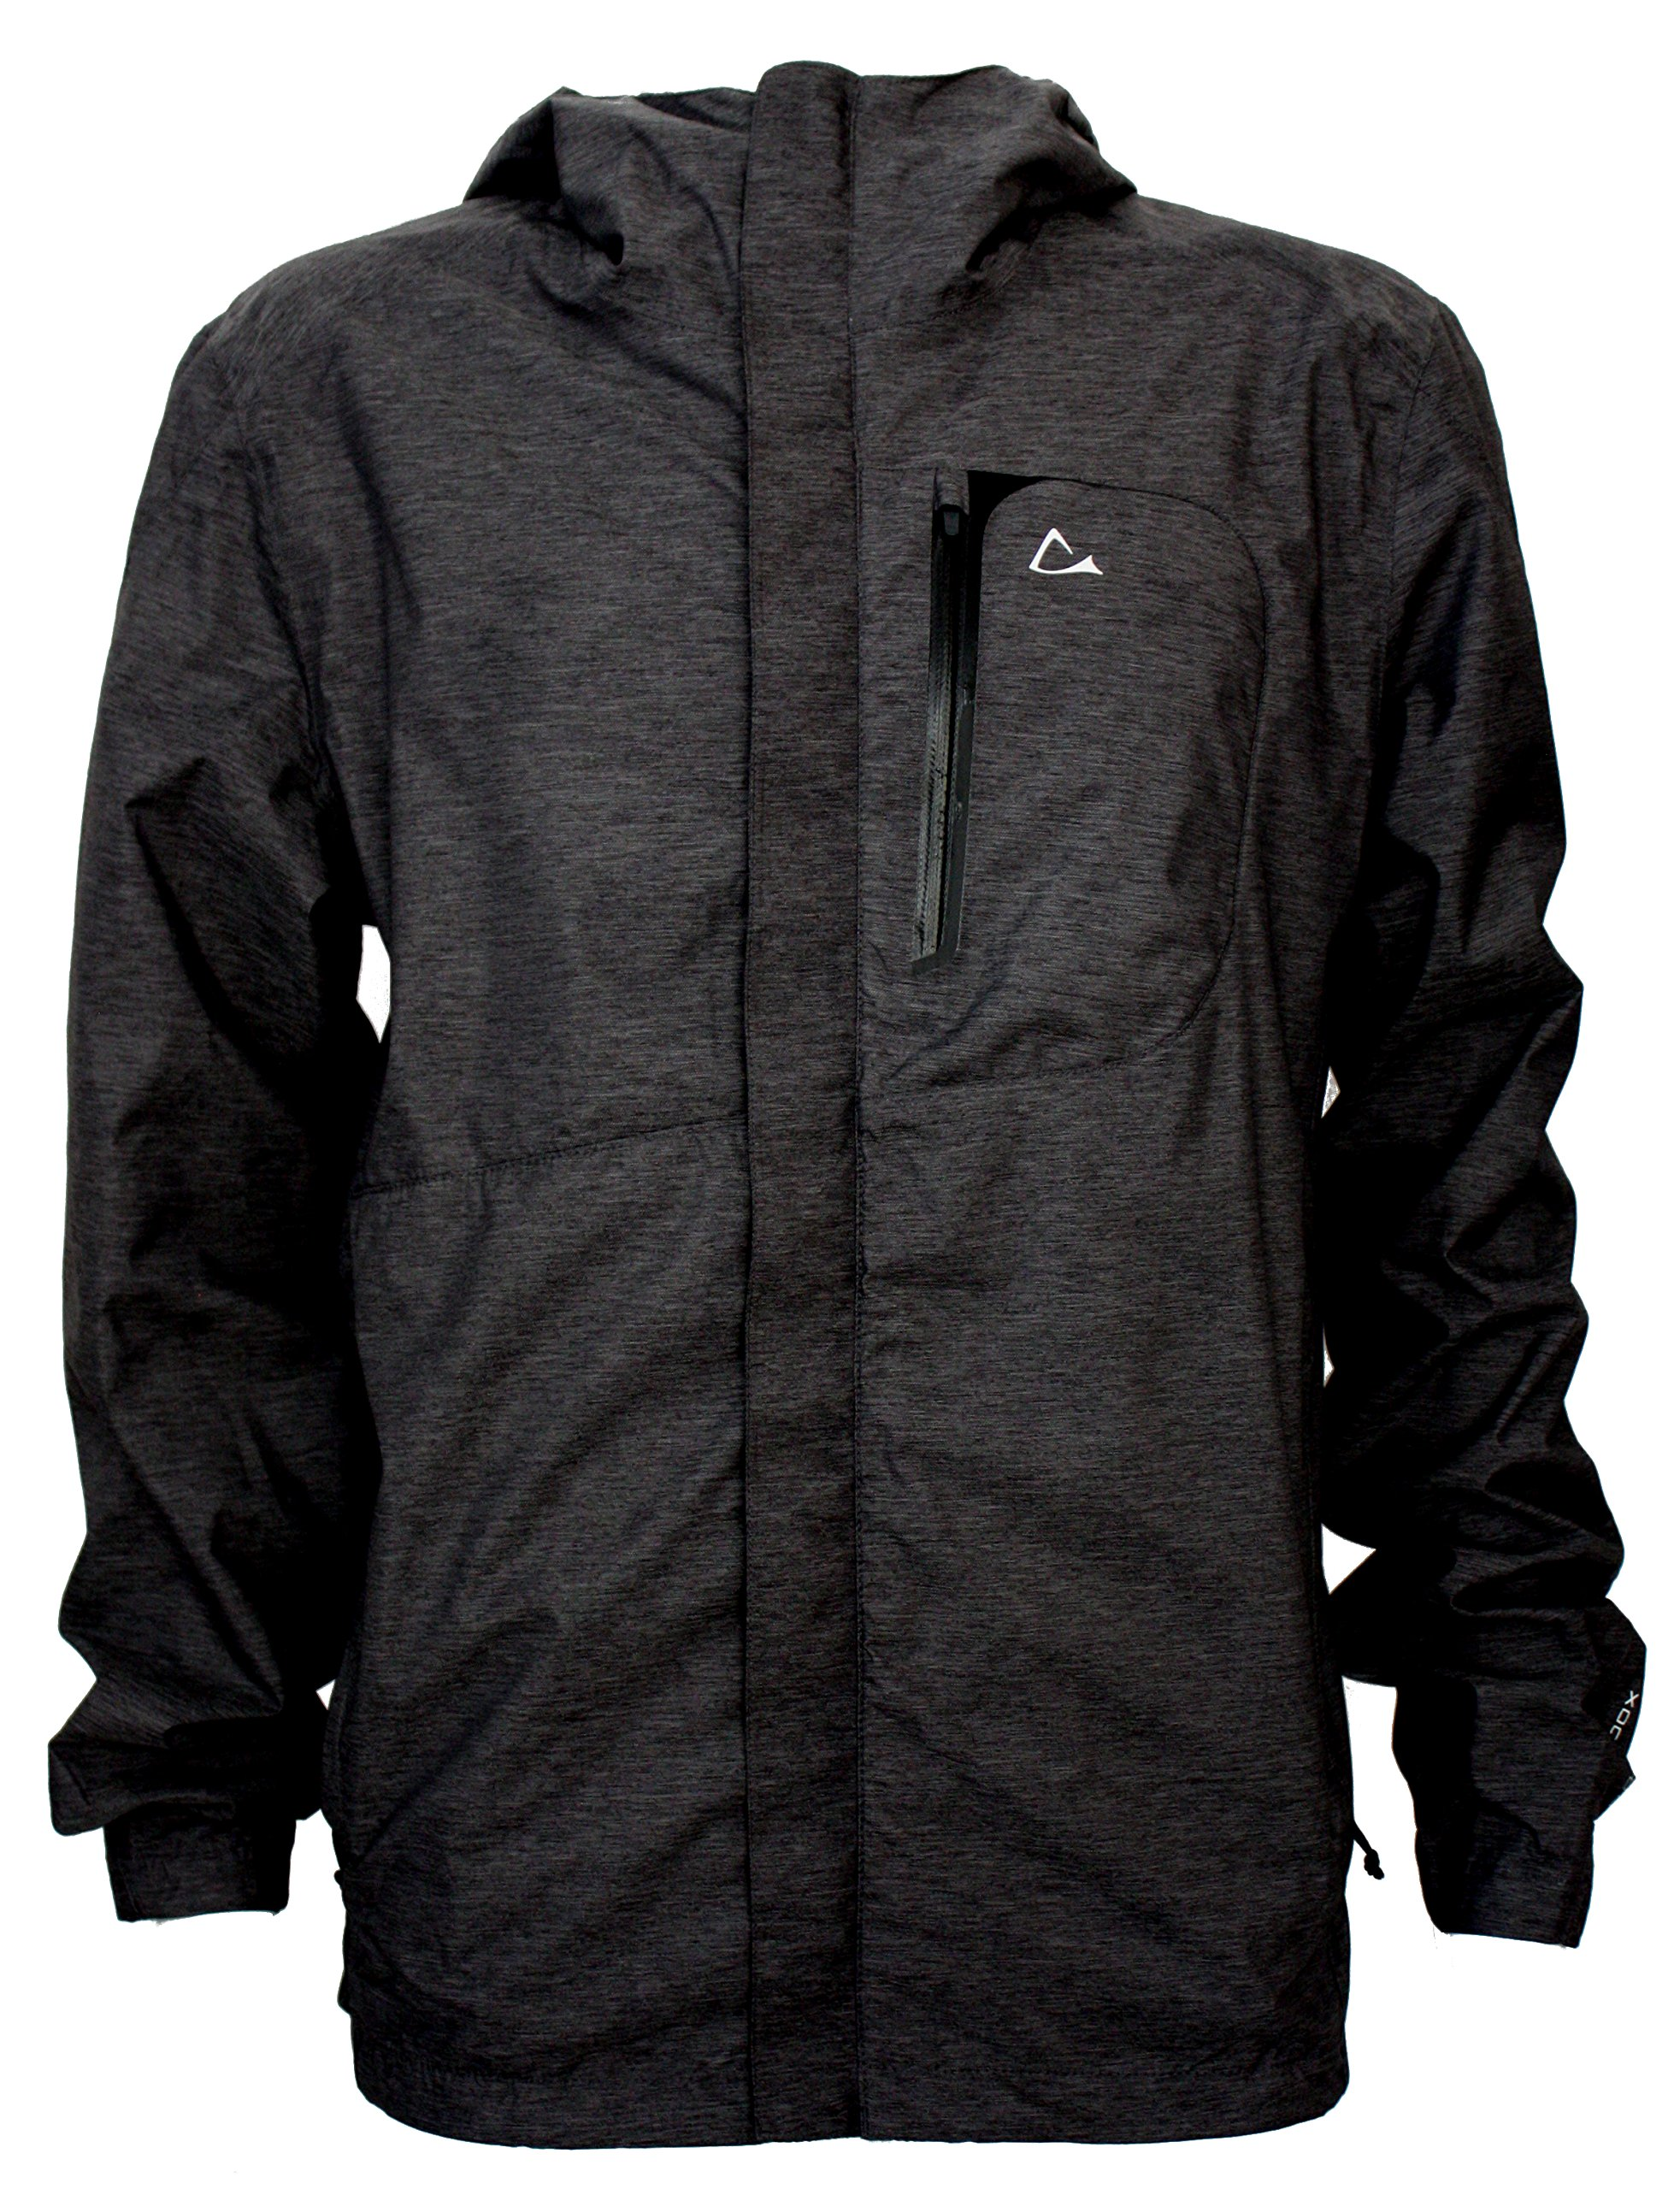 Paradox Mens Waterproof Breathable Rain Jacket Medium Black by Paradox